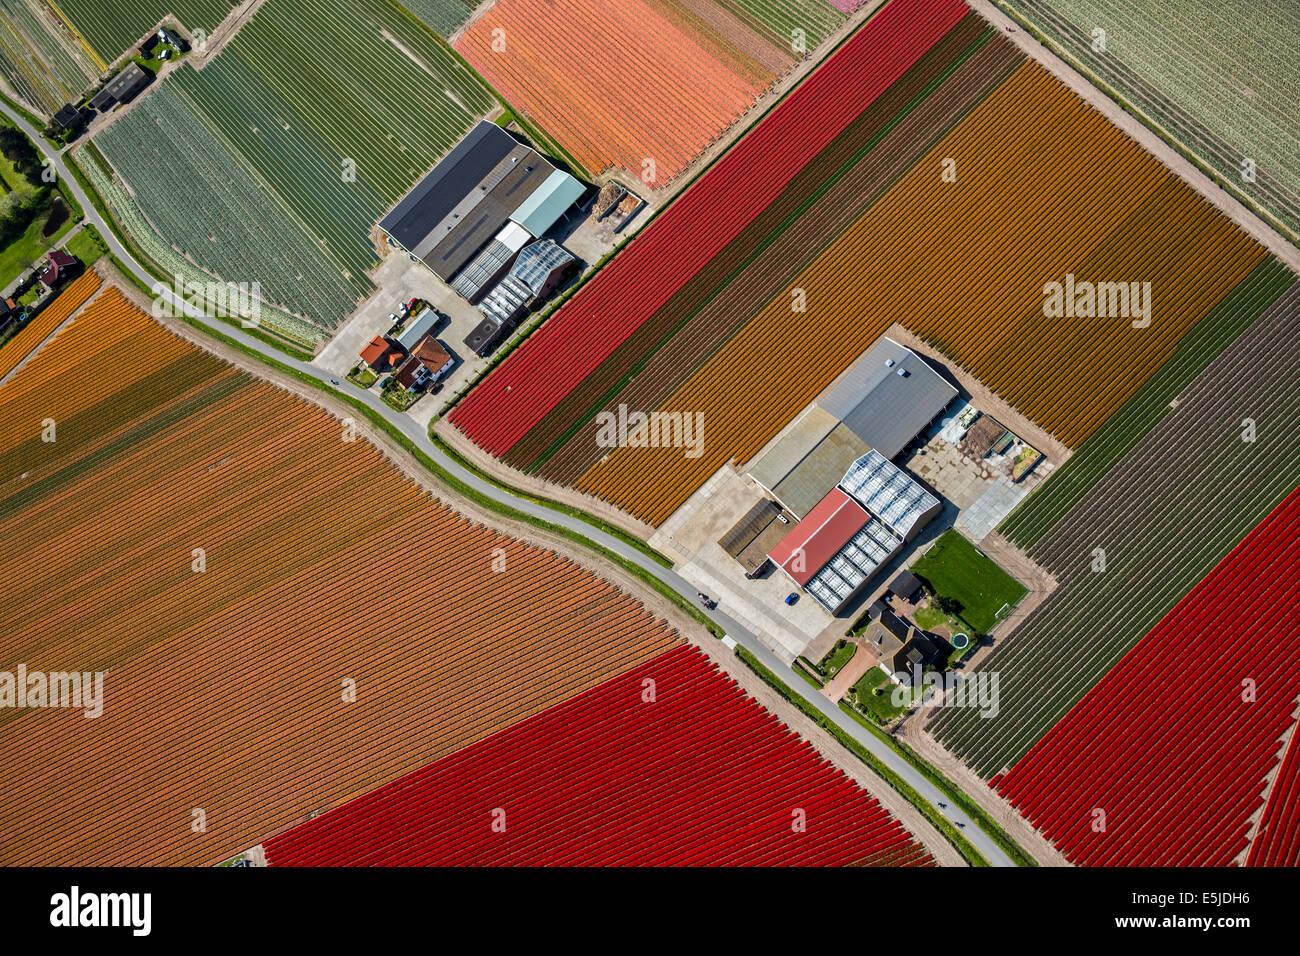 Paesi Bassi Egmond aan den Hoef campi di tulipani antenna Immagini Stock